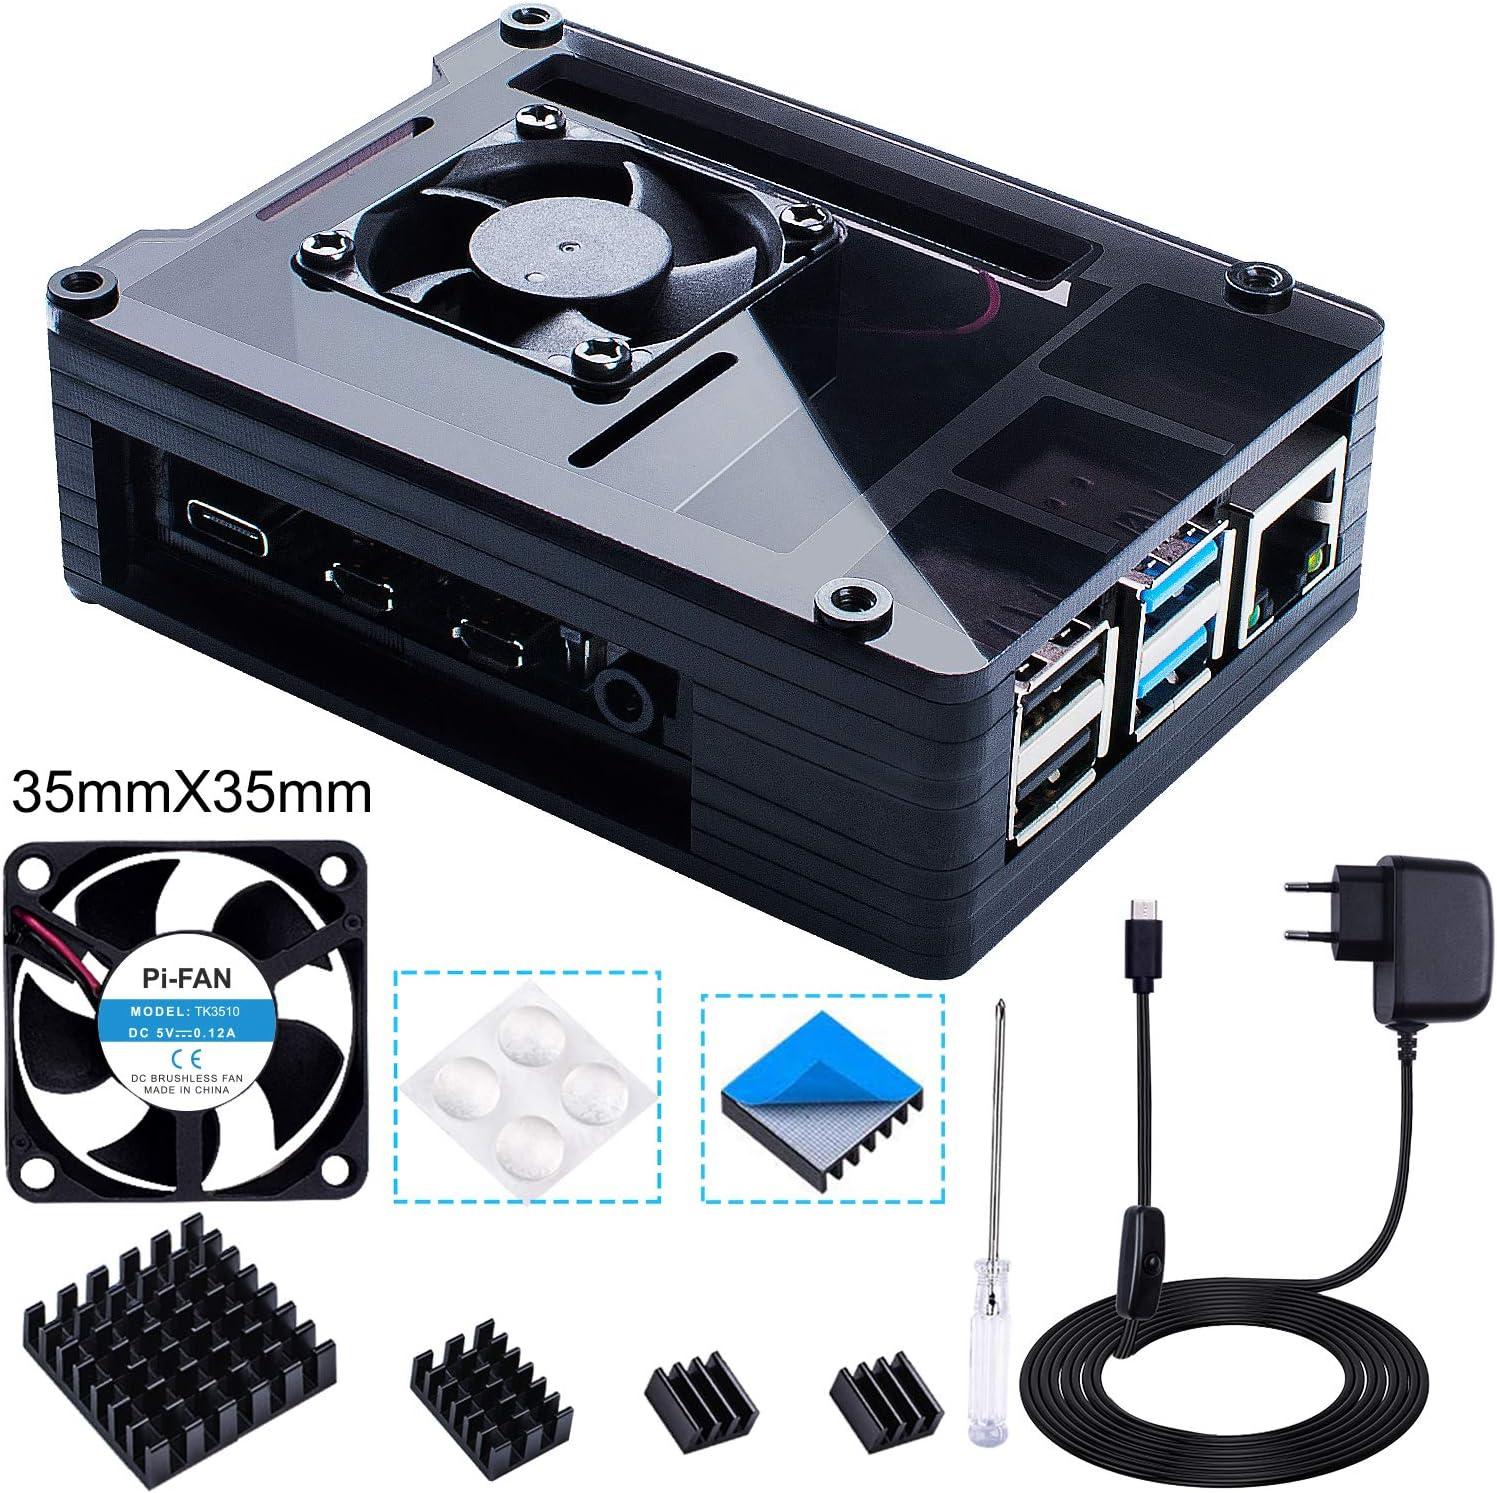 5V 3A USB-C Netzteil Gro/ß L/üfter + Gro/ß K/ühlk/örper Kompatibel mit Raspberry Pi 4 Modell B -Schwarz Bruphny Geh/äuse f/ür Raspberry Pi 4 mit 35mm L/üfter 4 /× Aluminium K/ühlk/örper